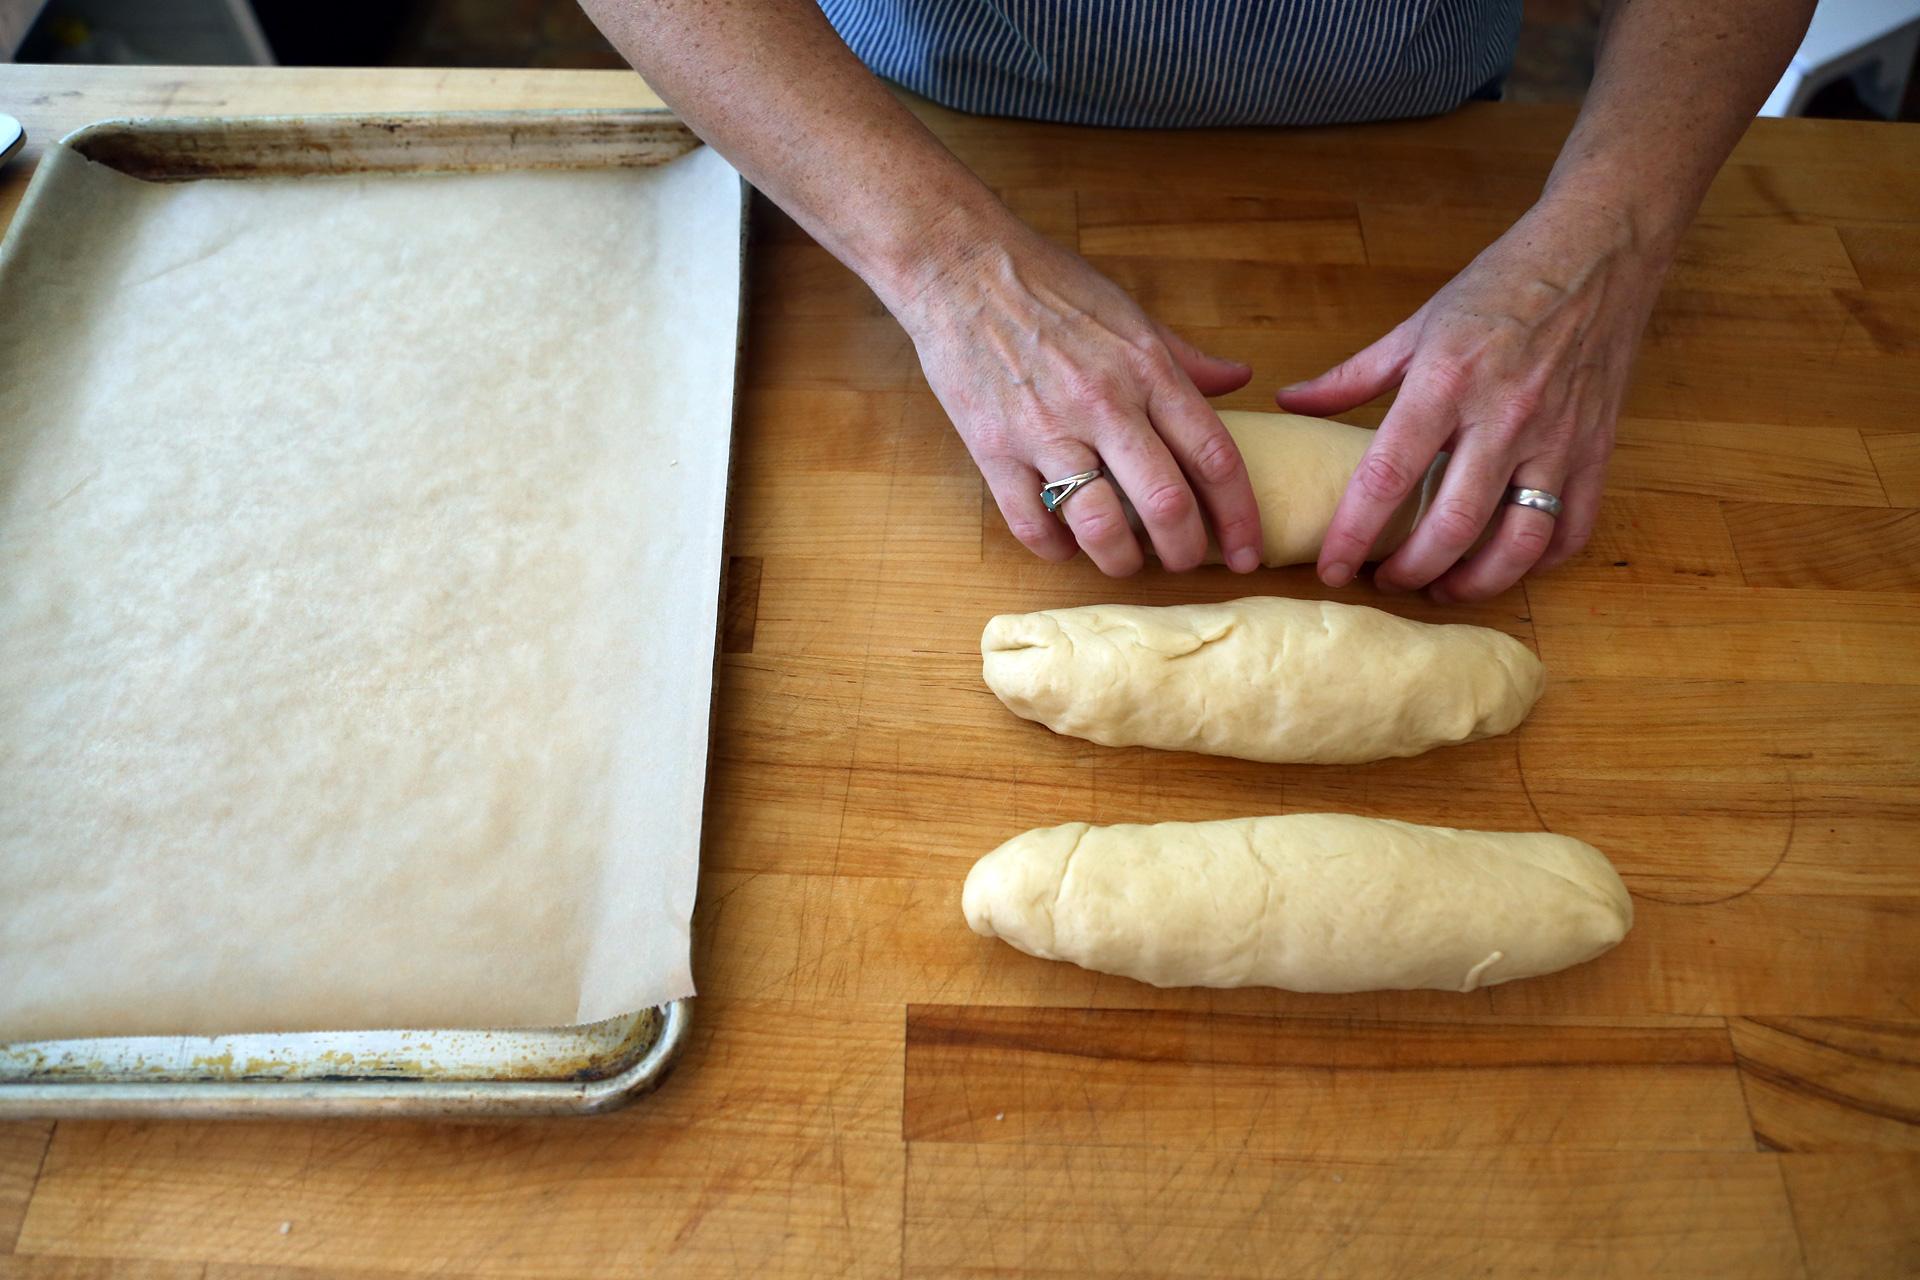 Divide the dough into 3 equal pieces.